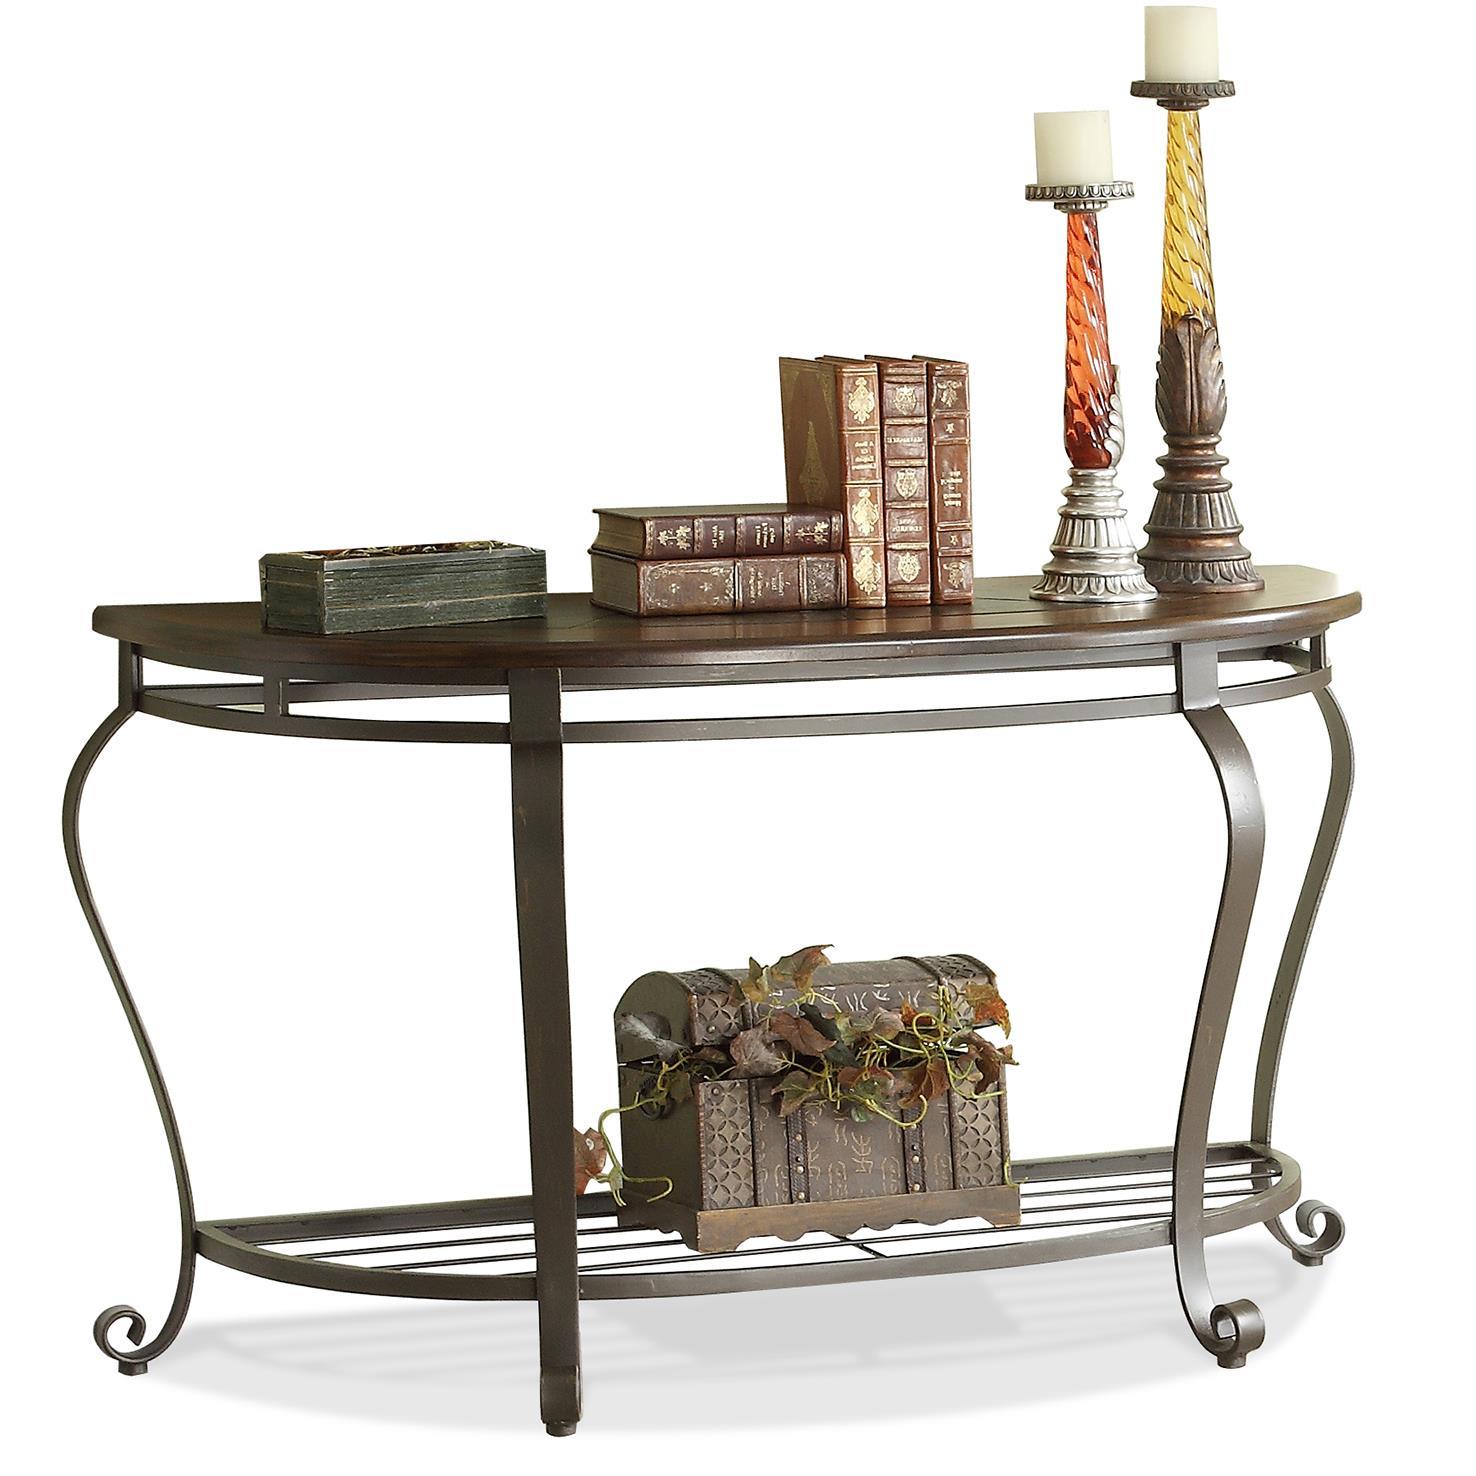 Riverside Furniture Eastview Demilune Sofa Table - Item Number: 54715